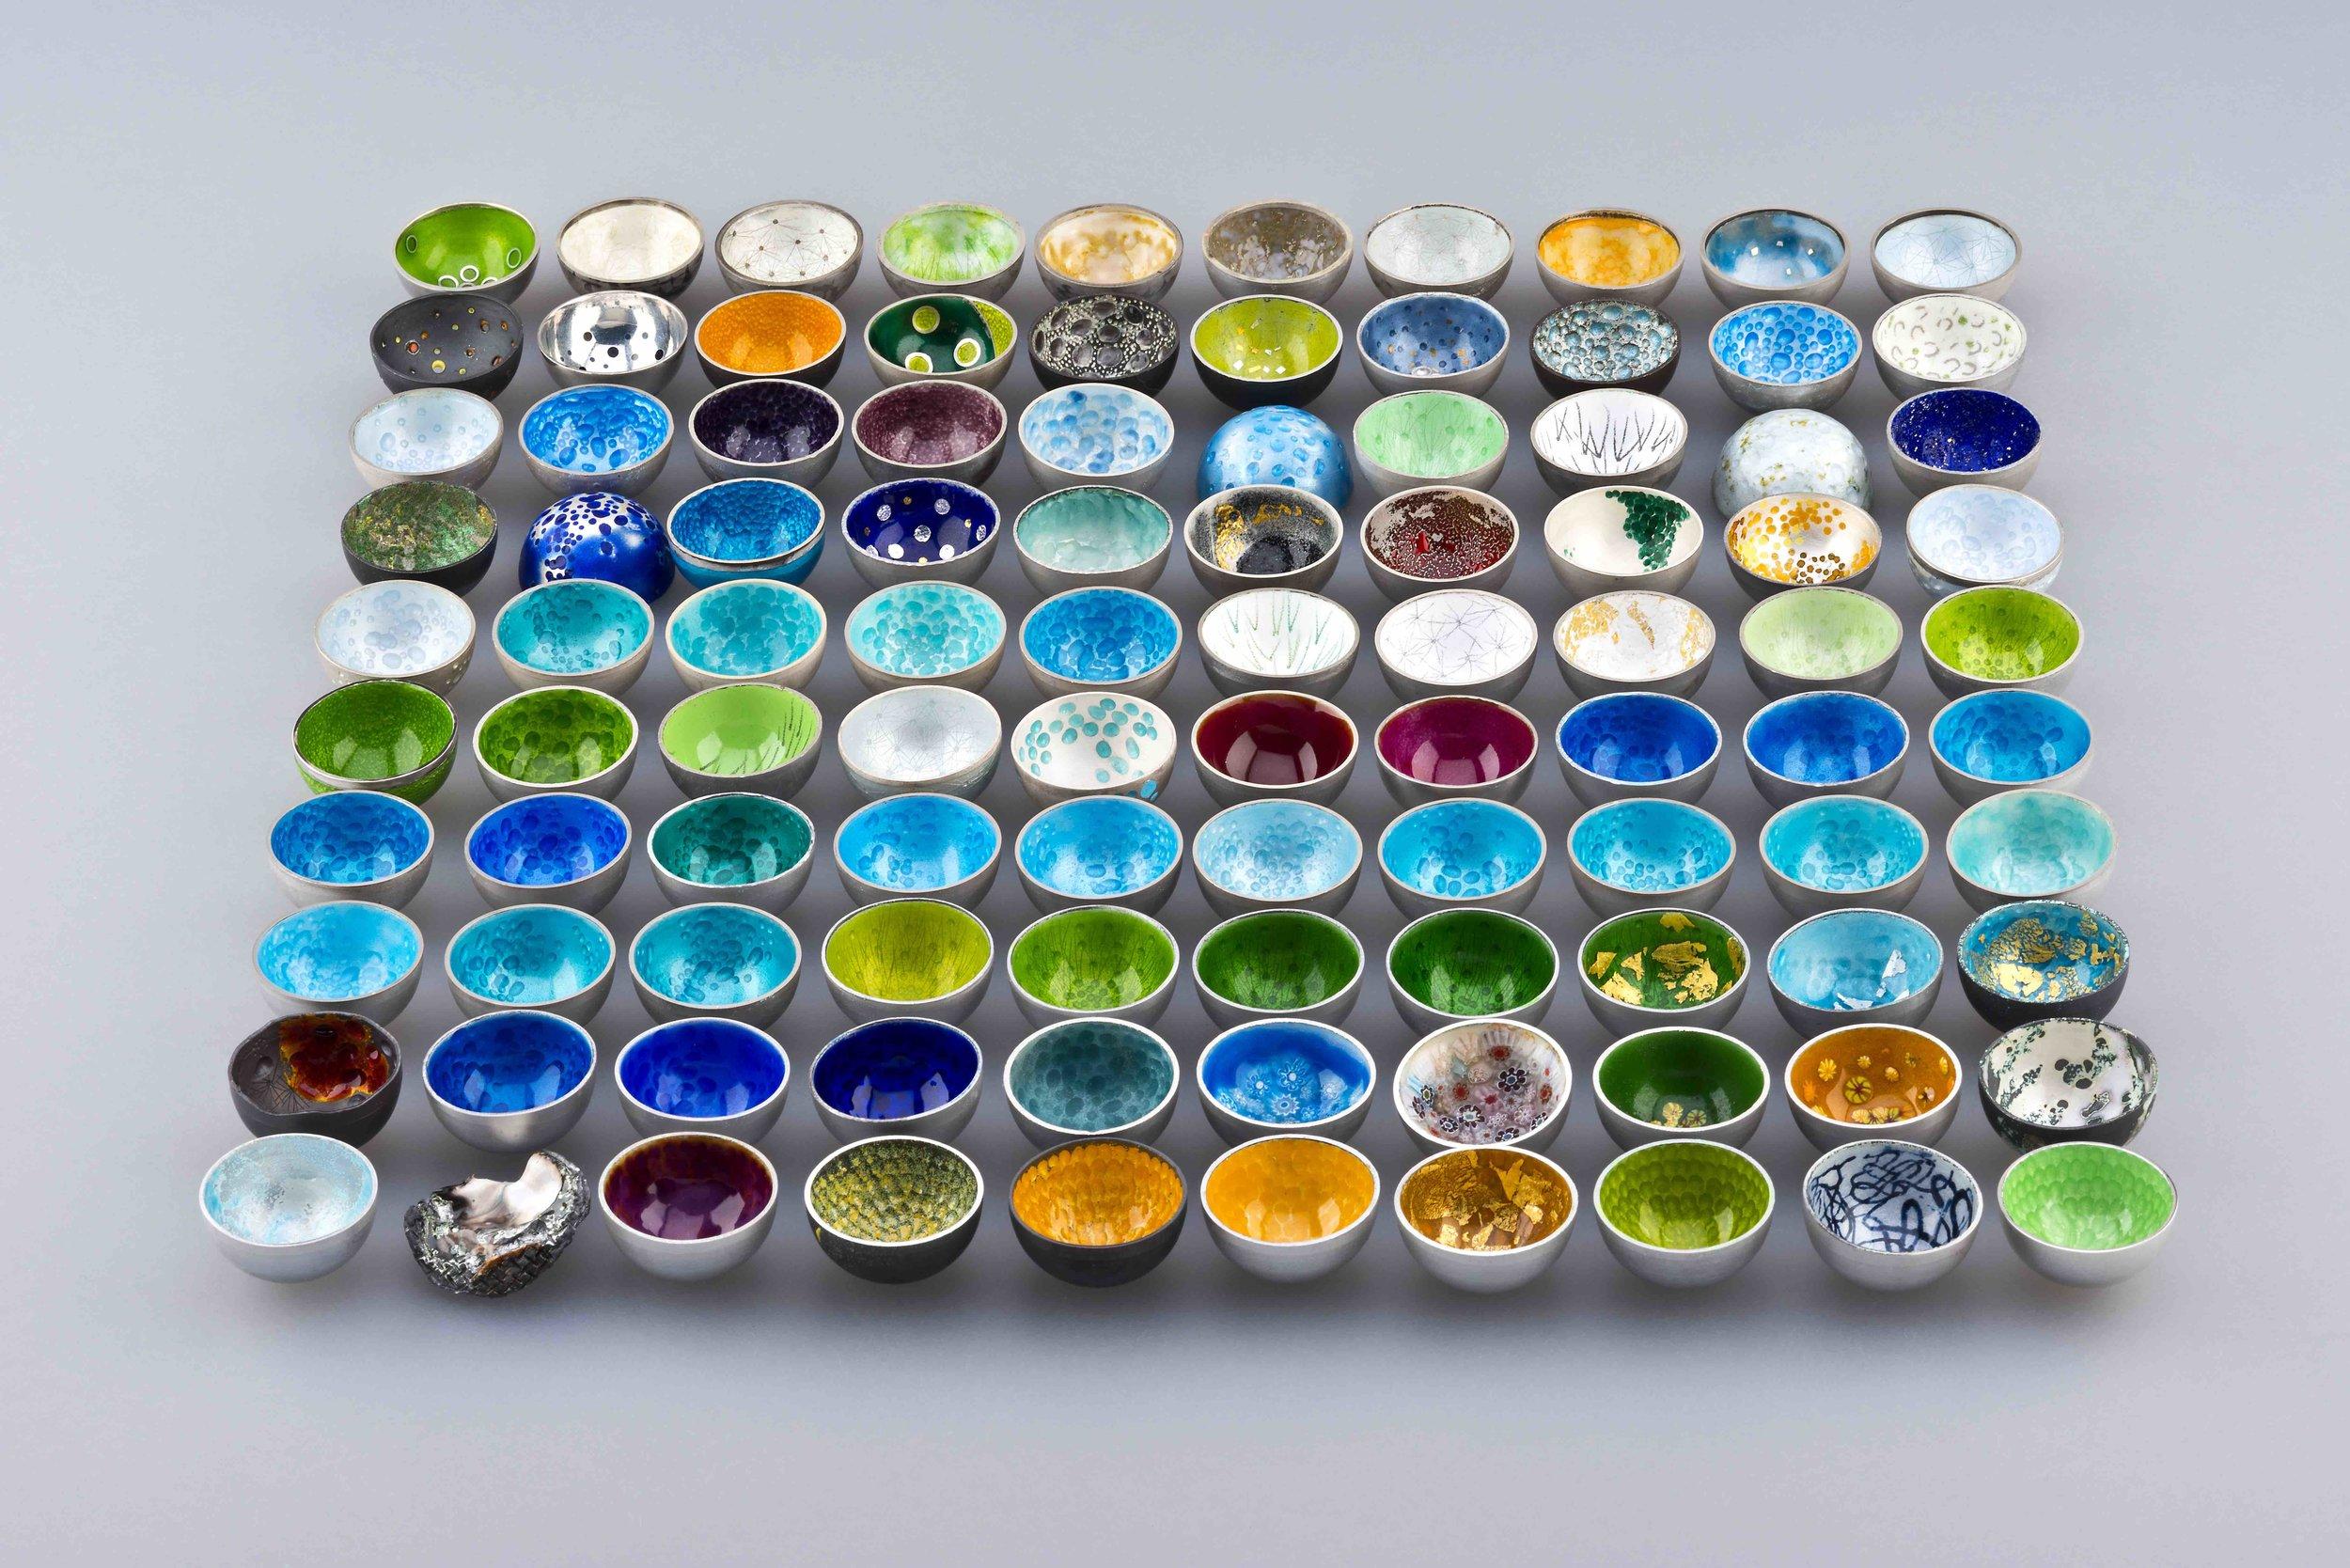 100_bowls_.jpg